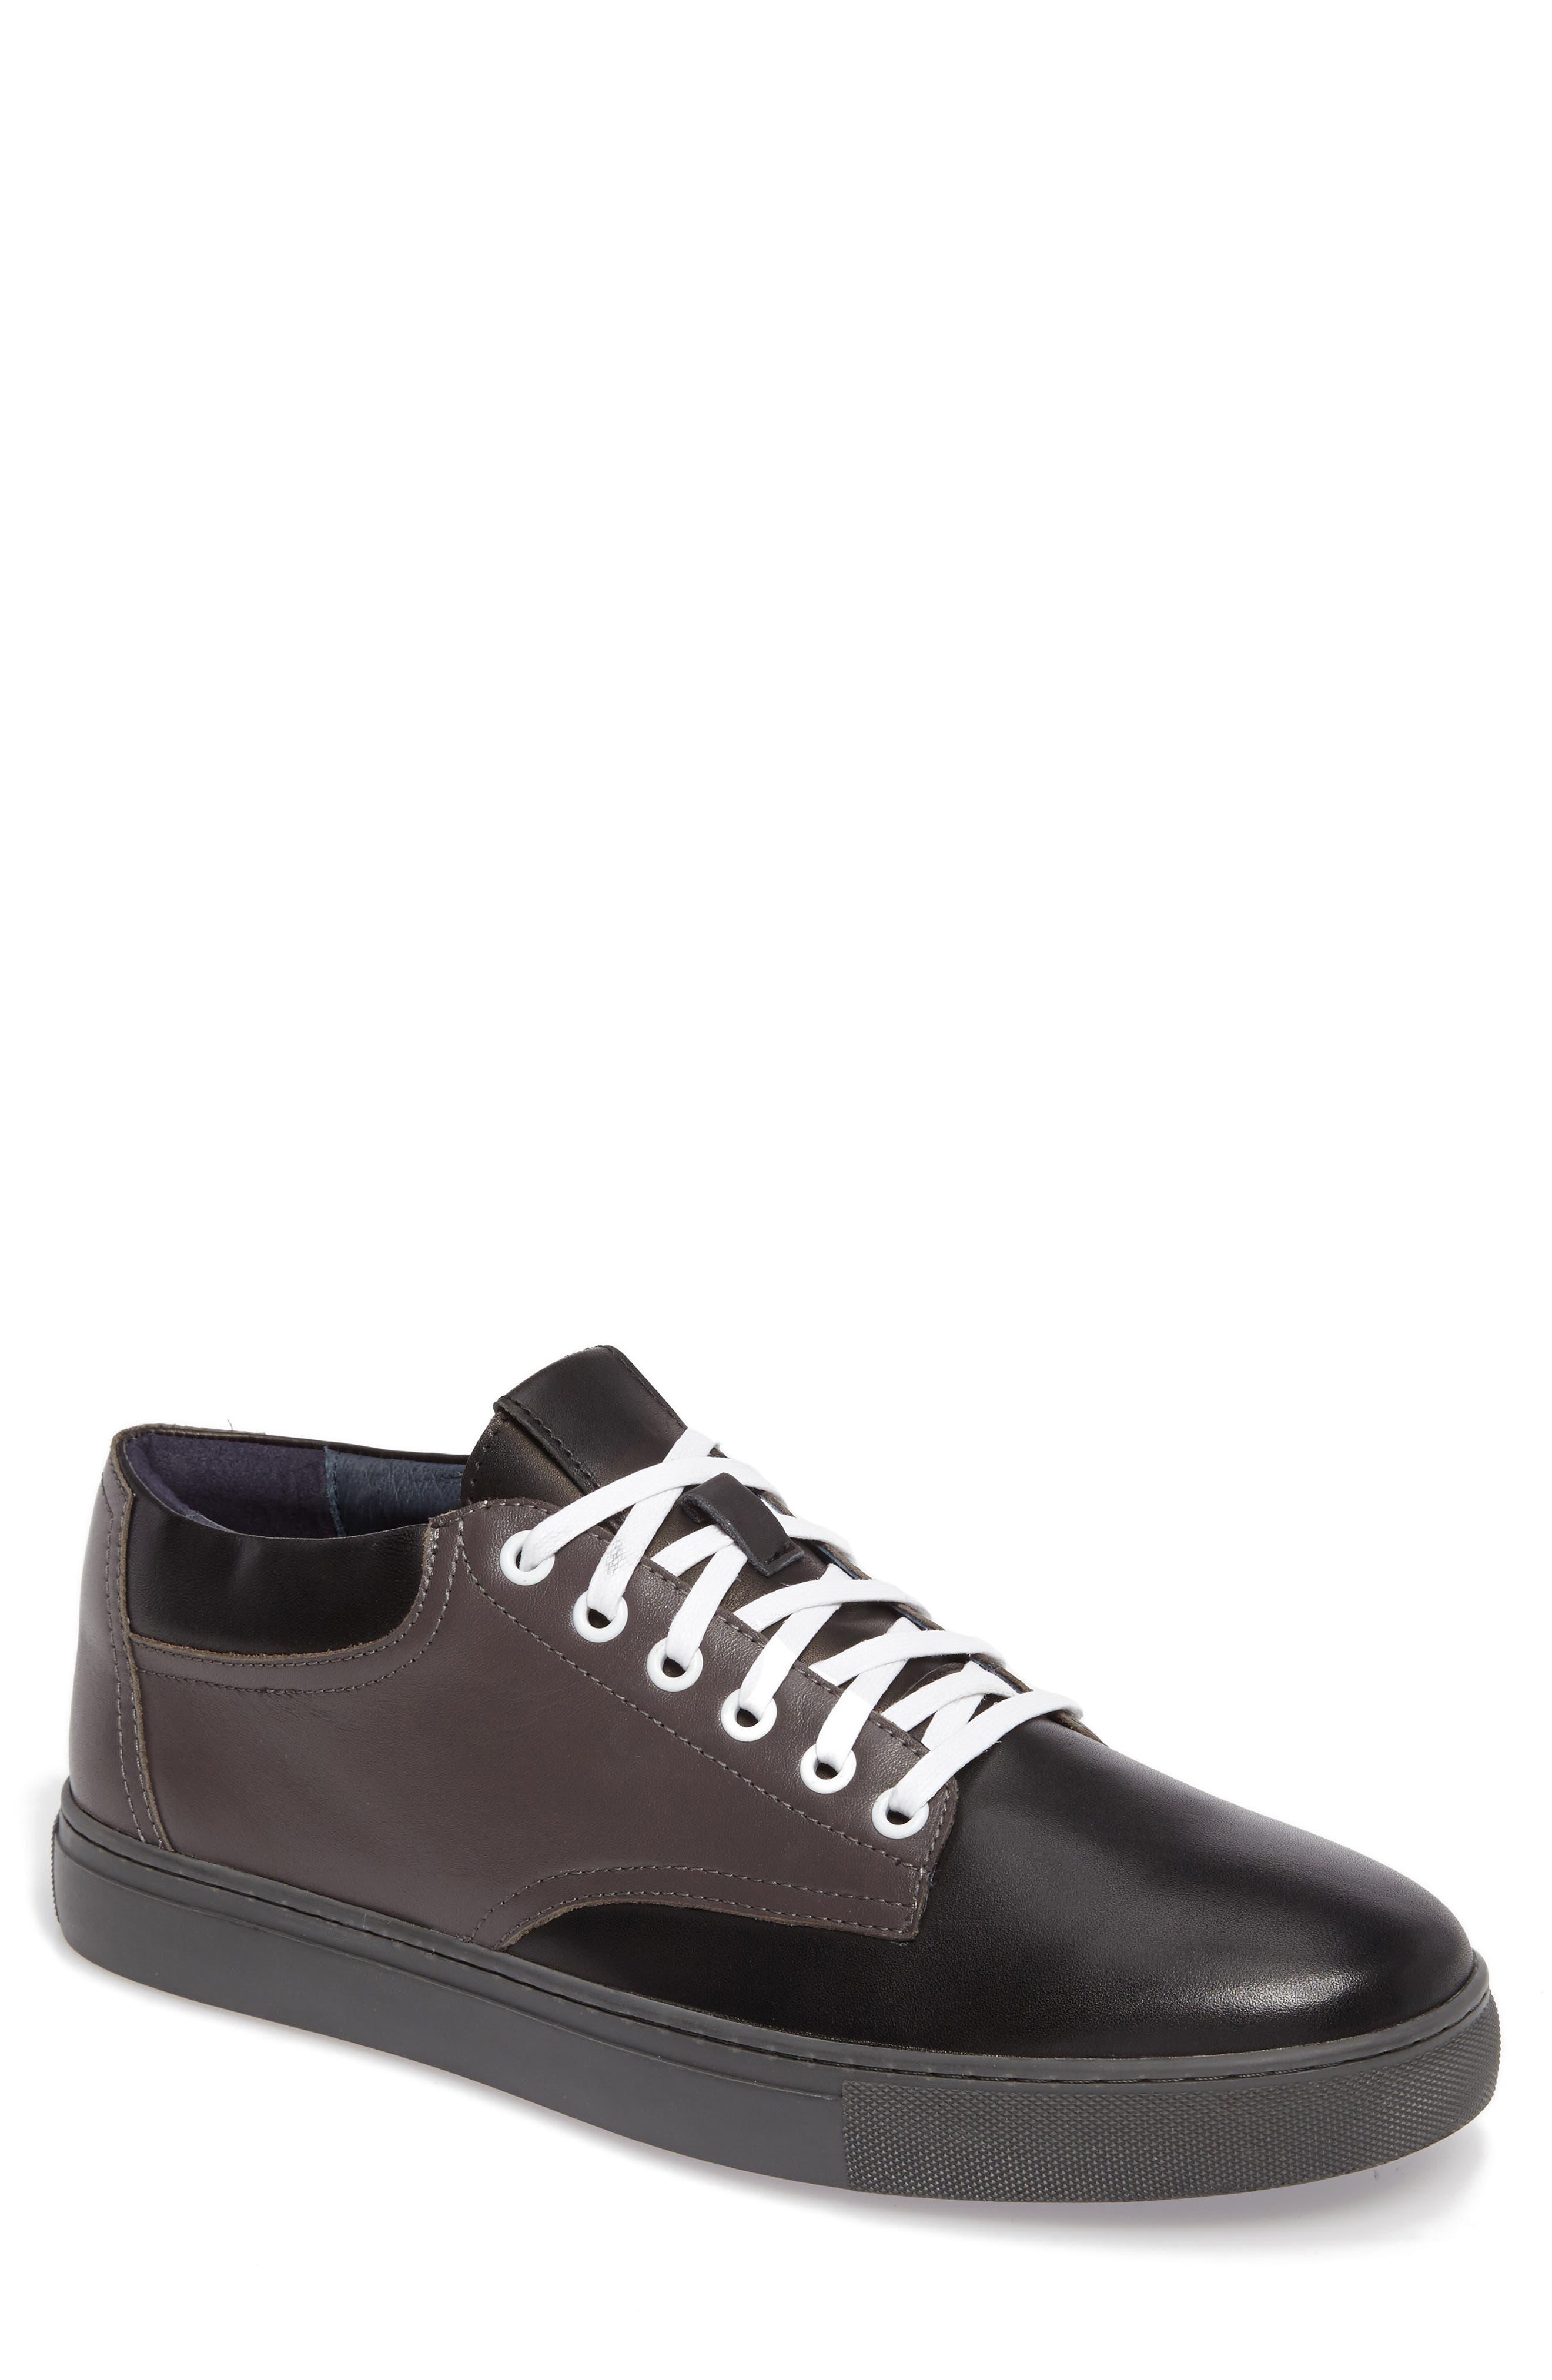 Zanzara Ralston Sneaker (Men)